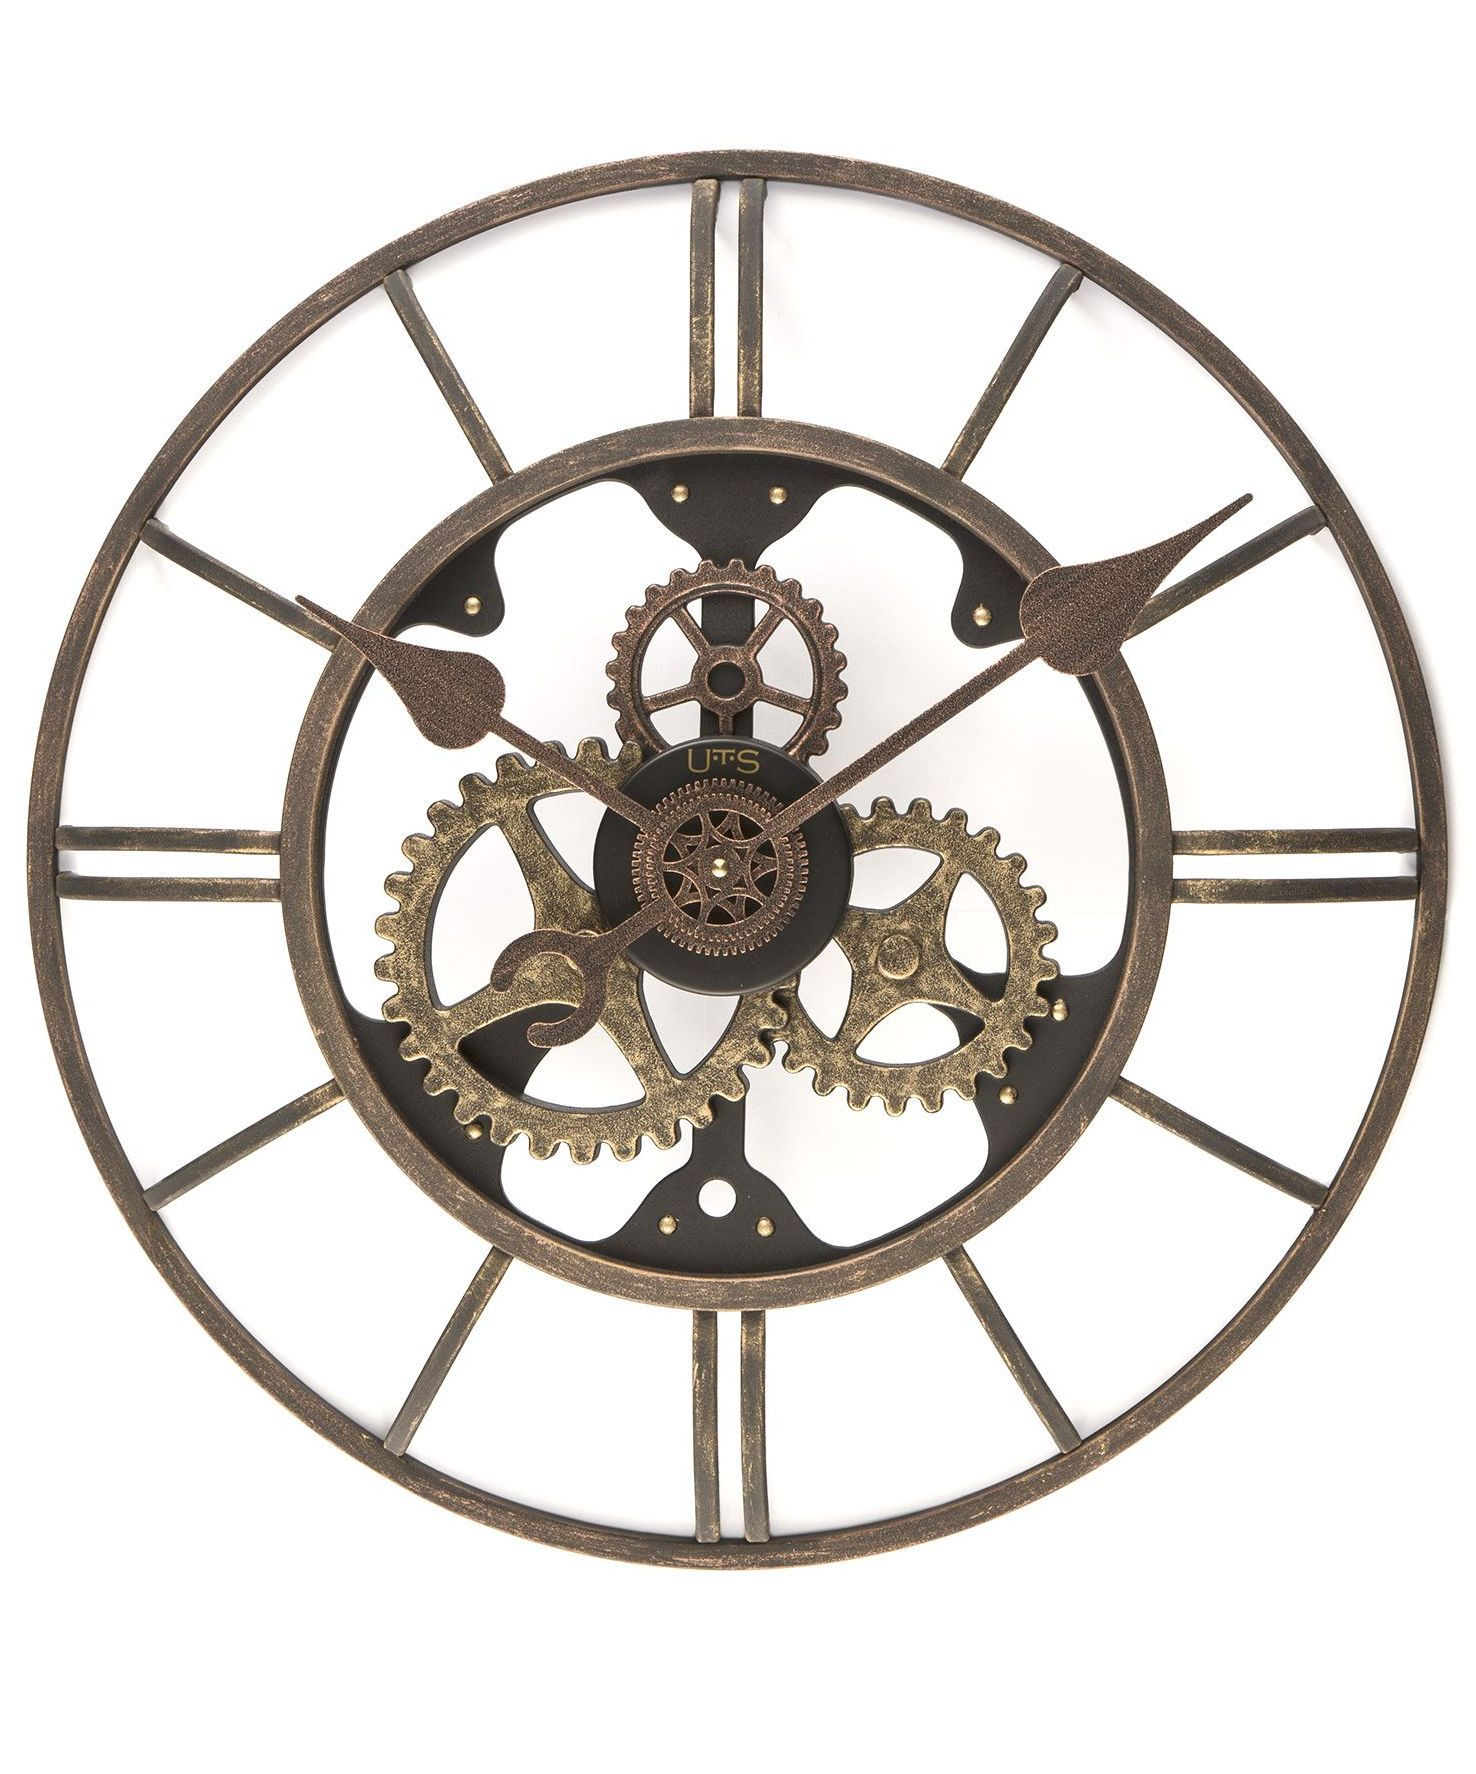 Часы настенные Часы настенные Tomas Stern 9001 chasy-nastennye-tomas-stern-9001-germaniya.jpg